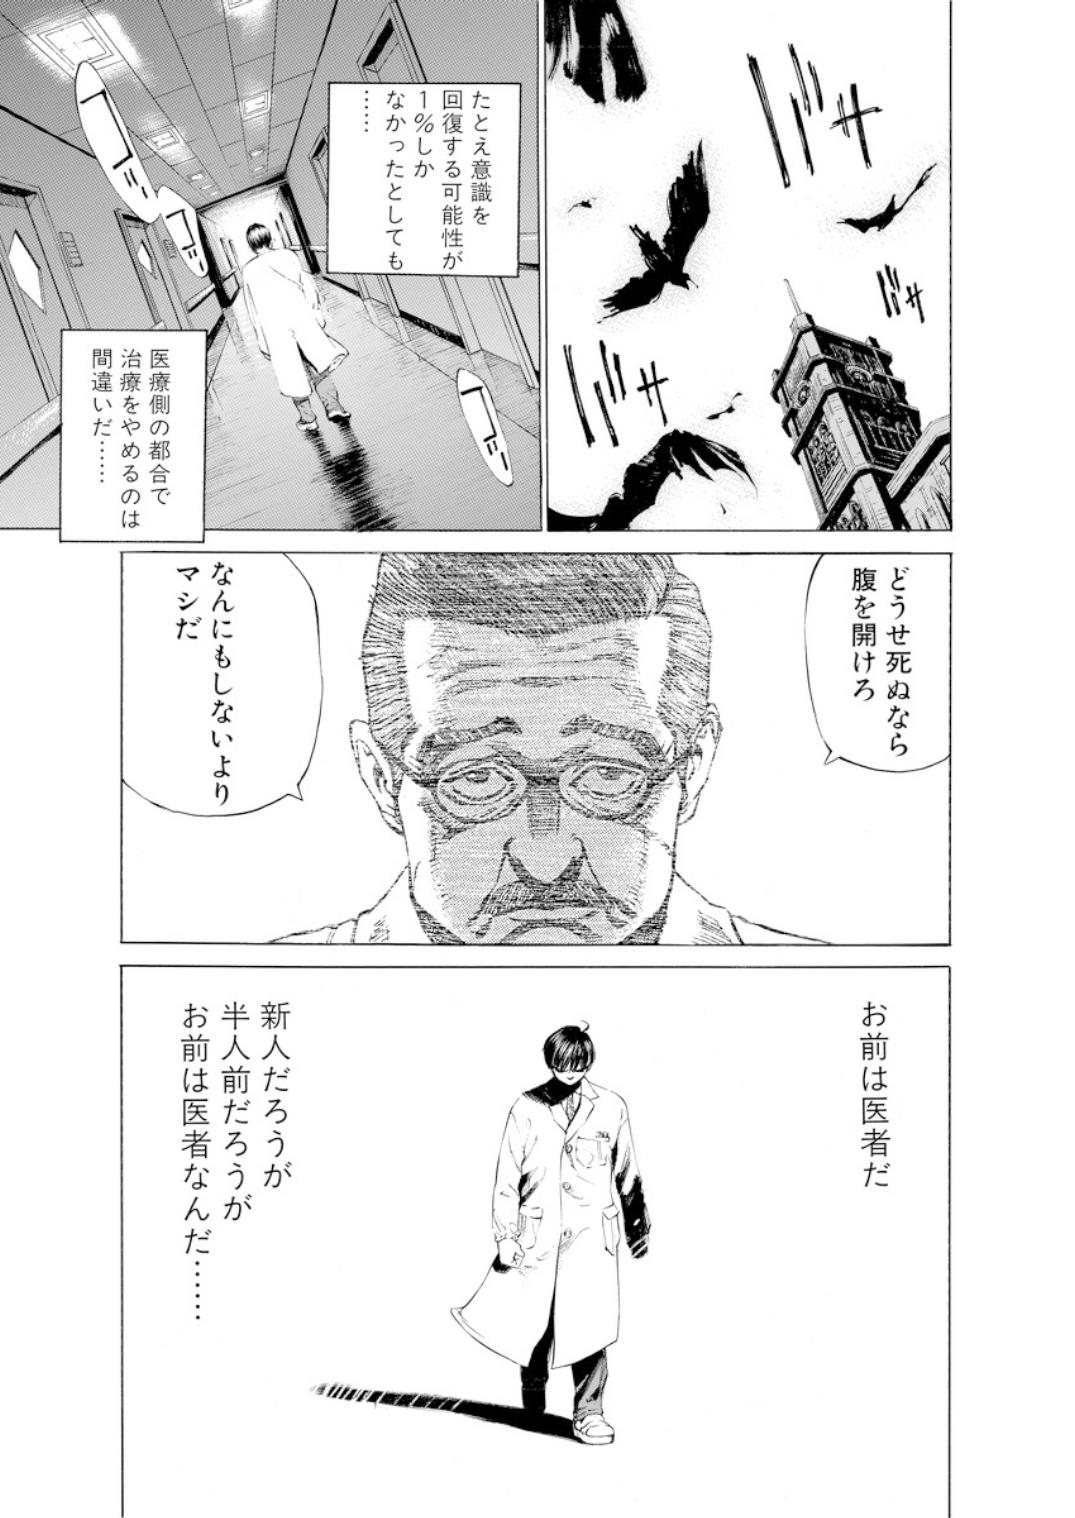 001bj_page-0123.jpg